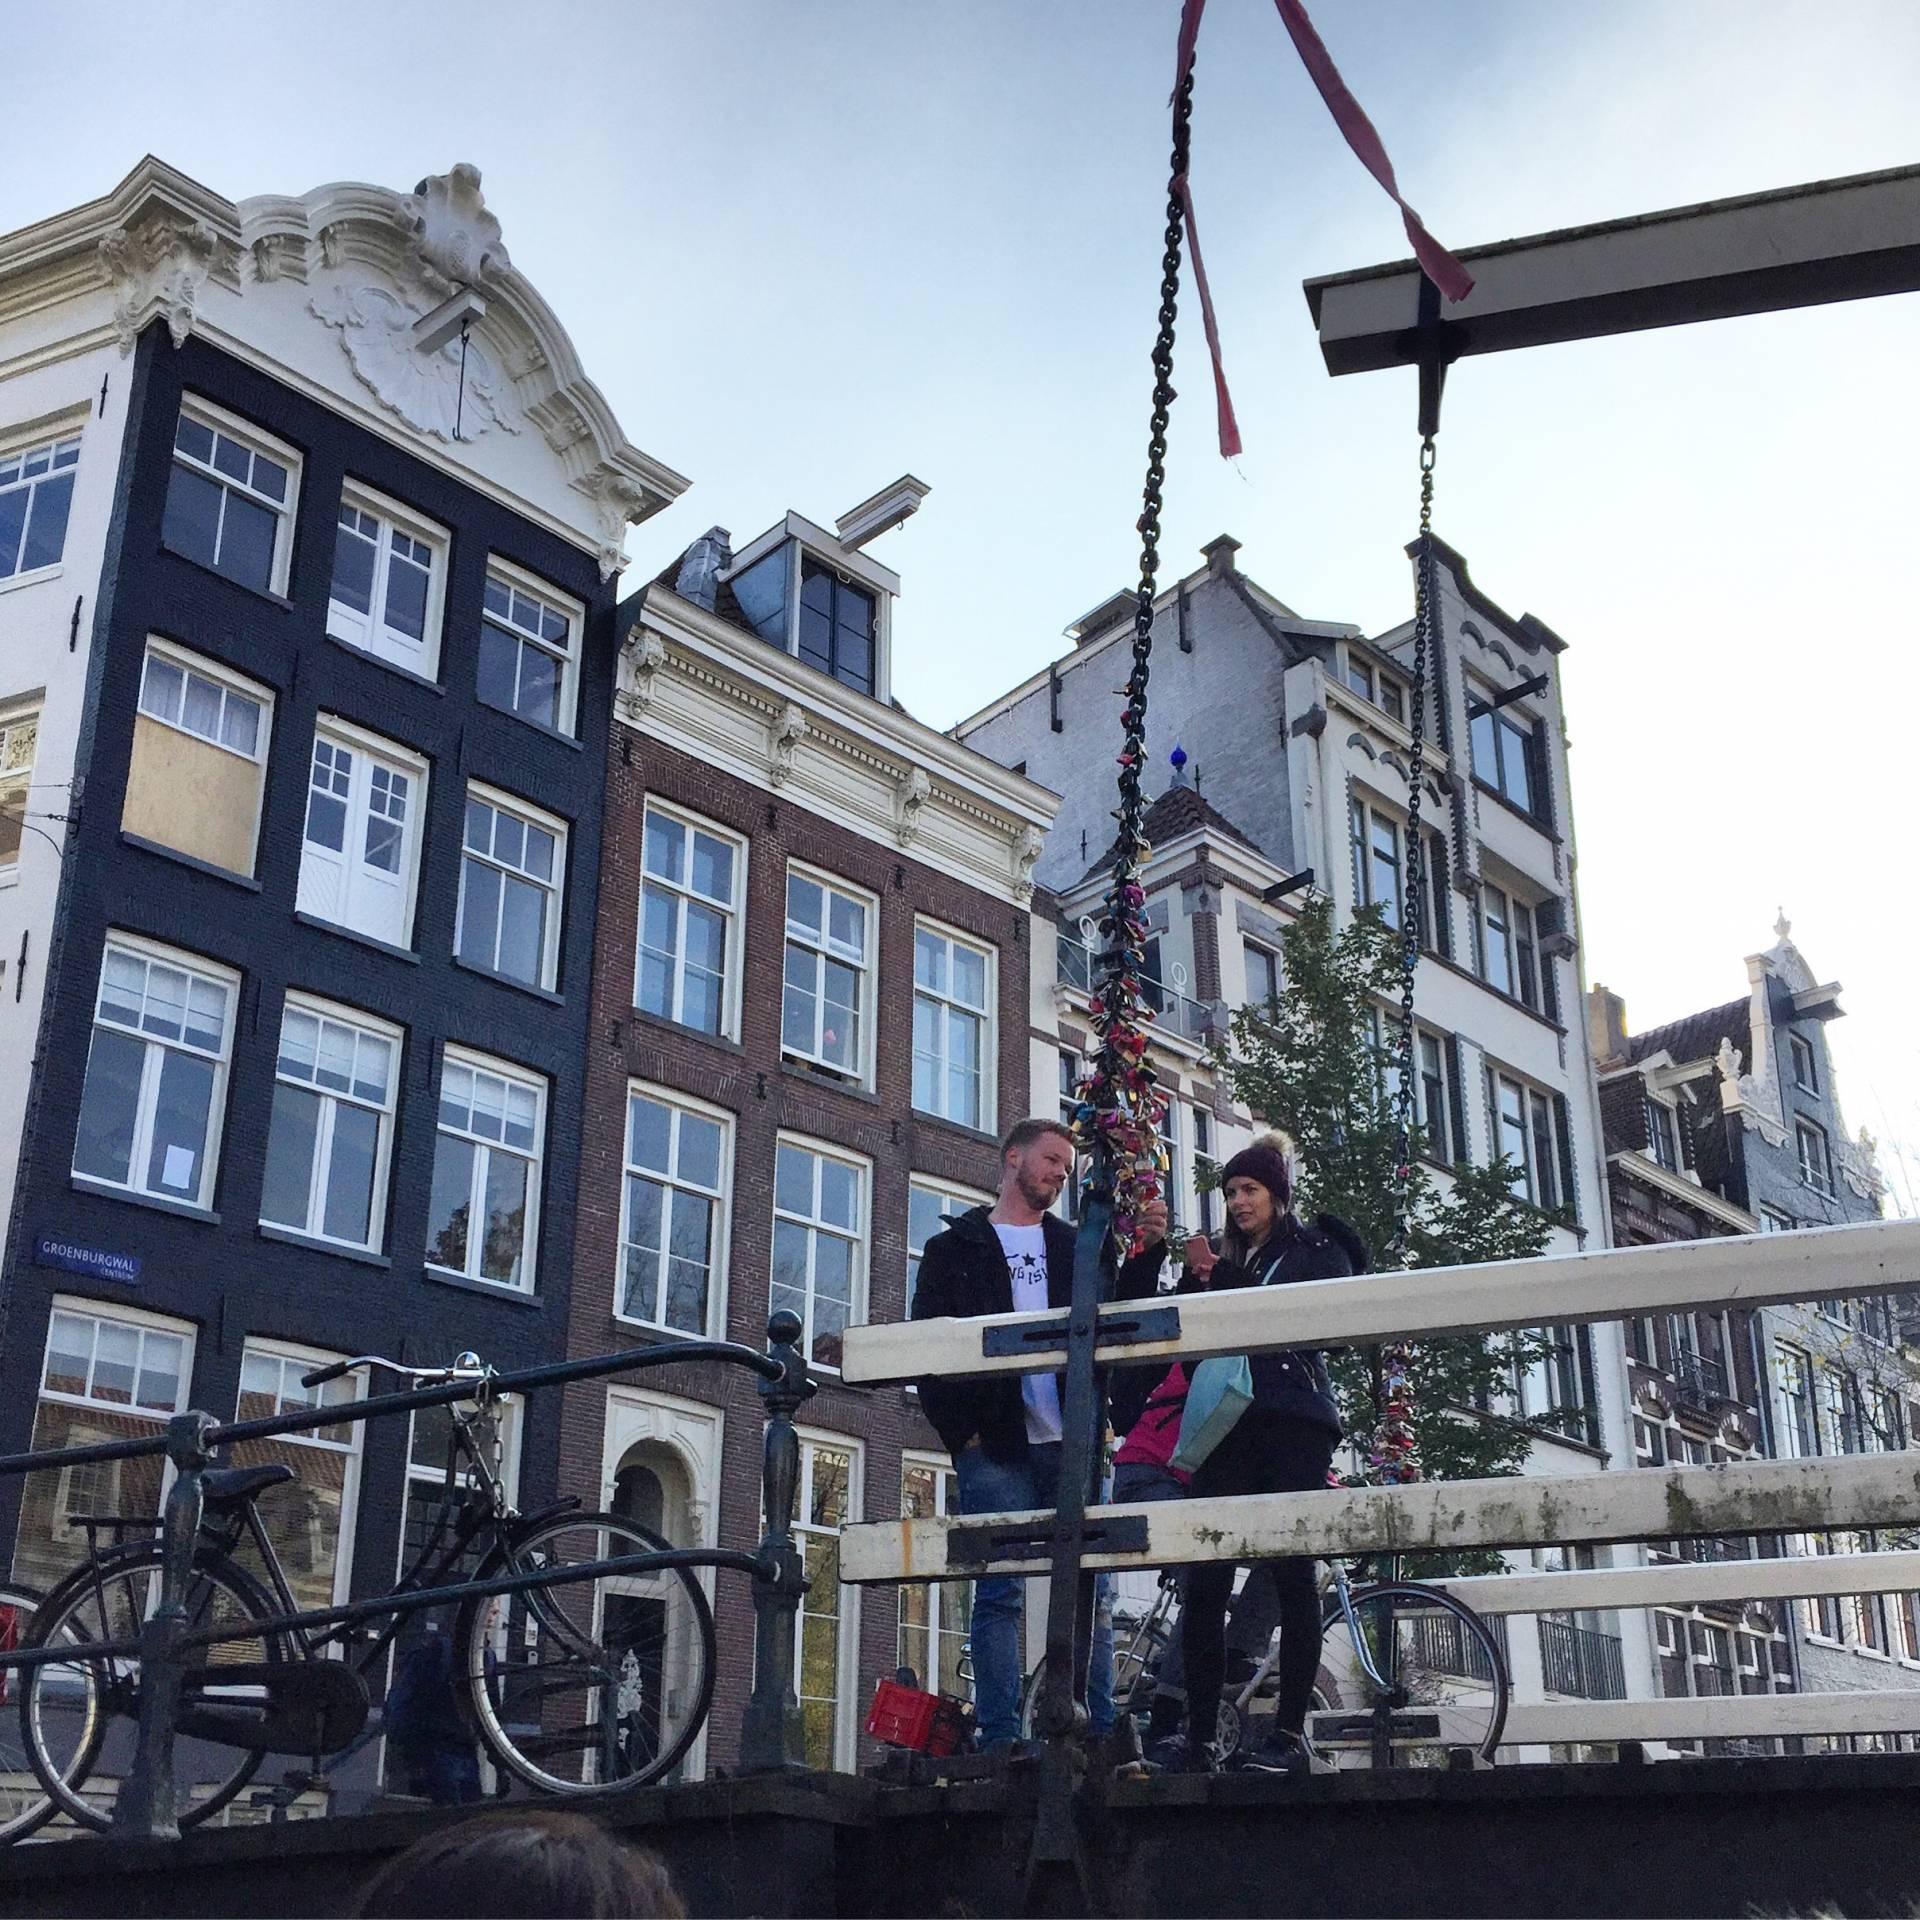 Friendship Amsterdam Best Canal Cruise